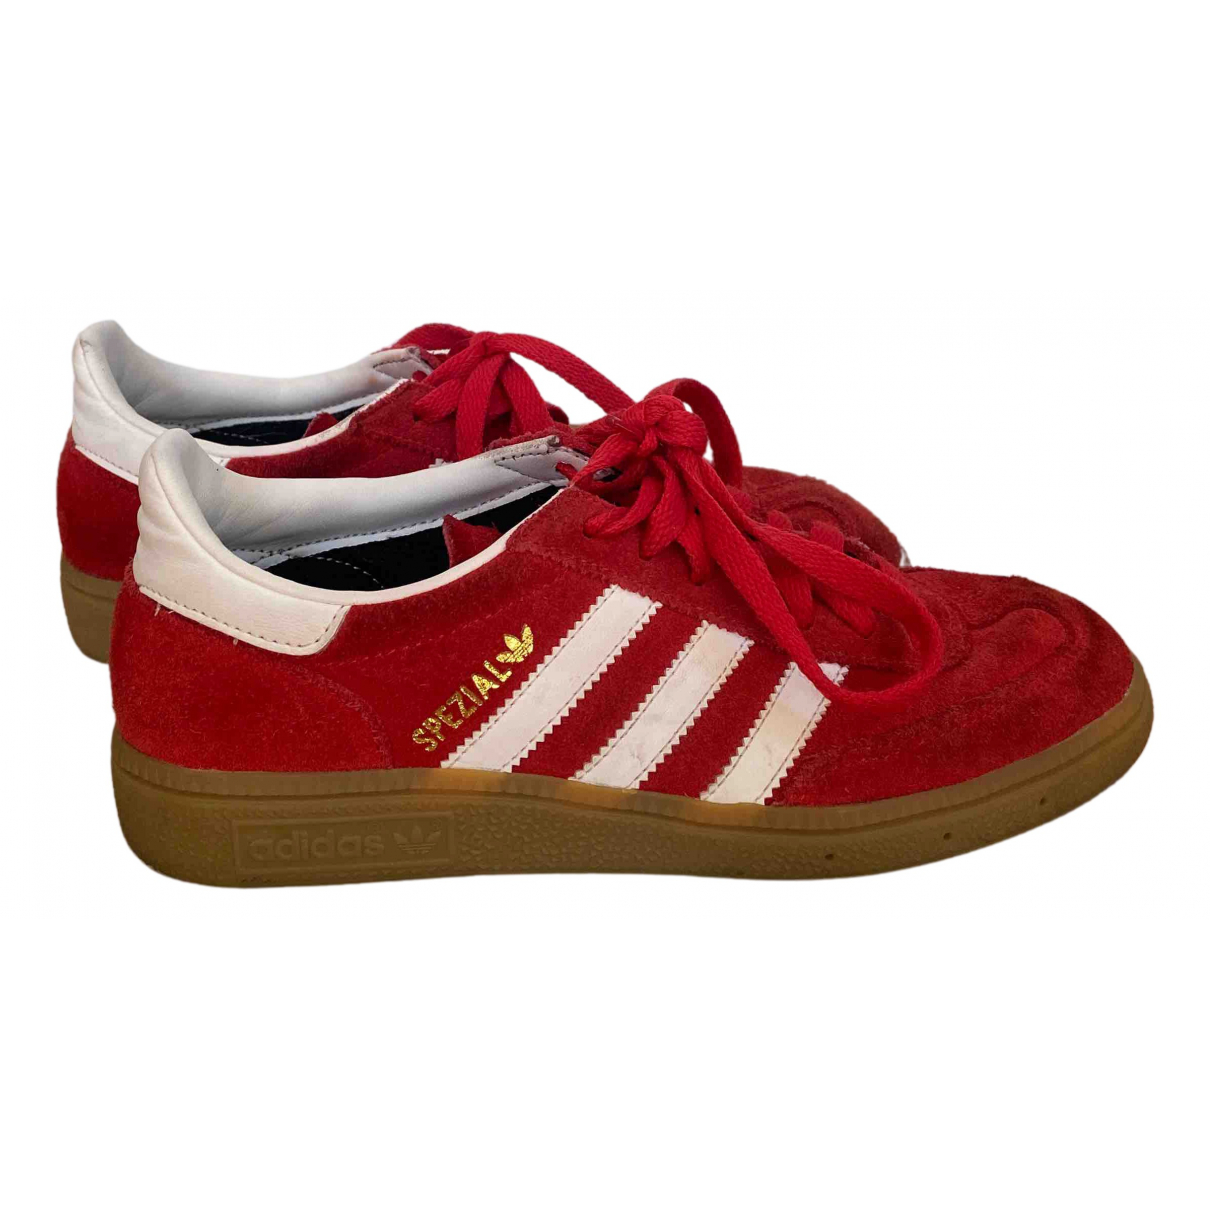 Adidas Gazelle Sneakers in  Rot Veloursleder